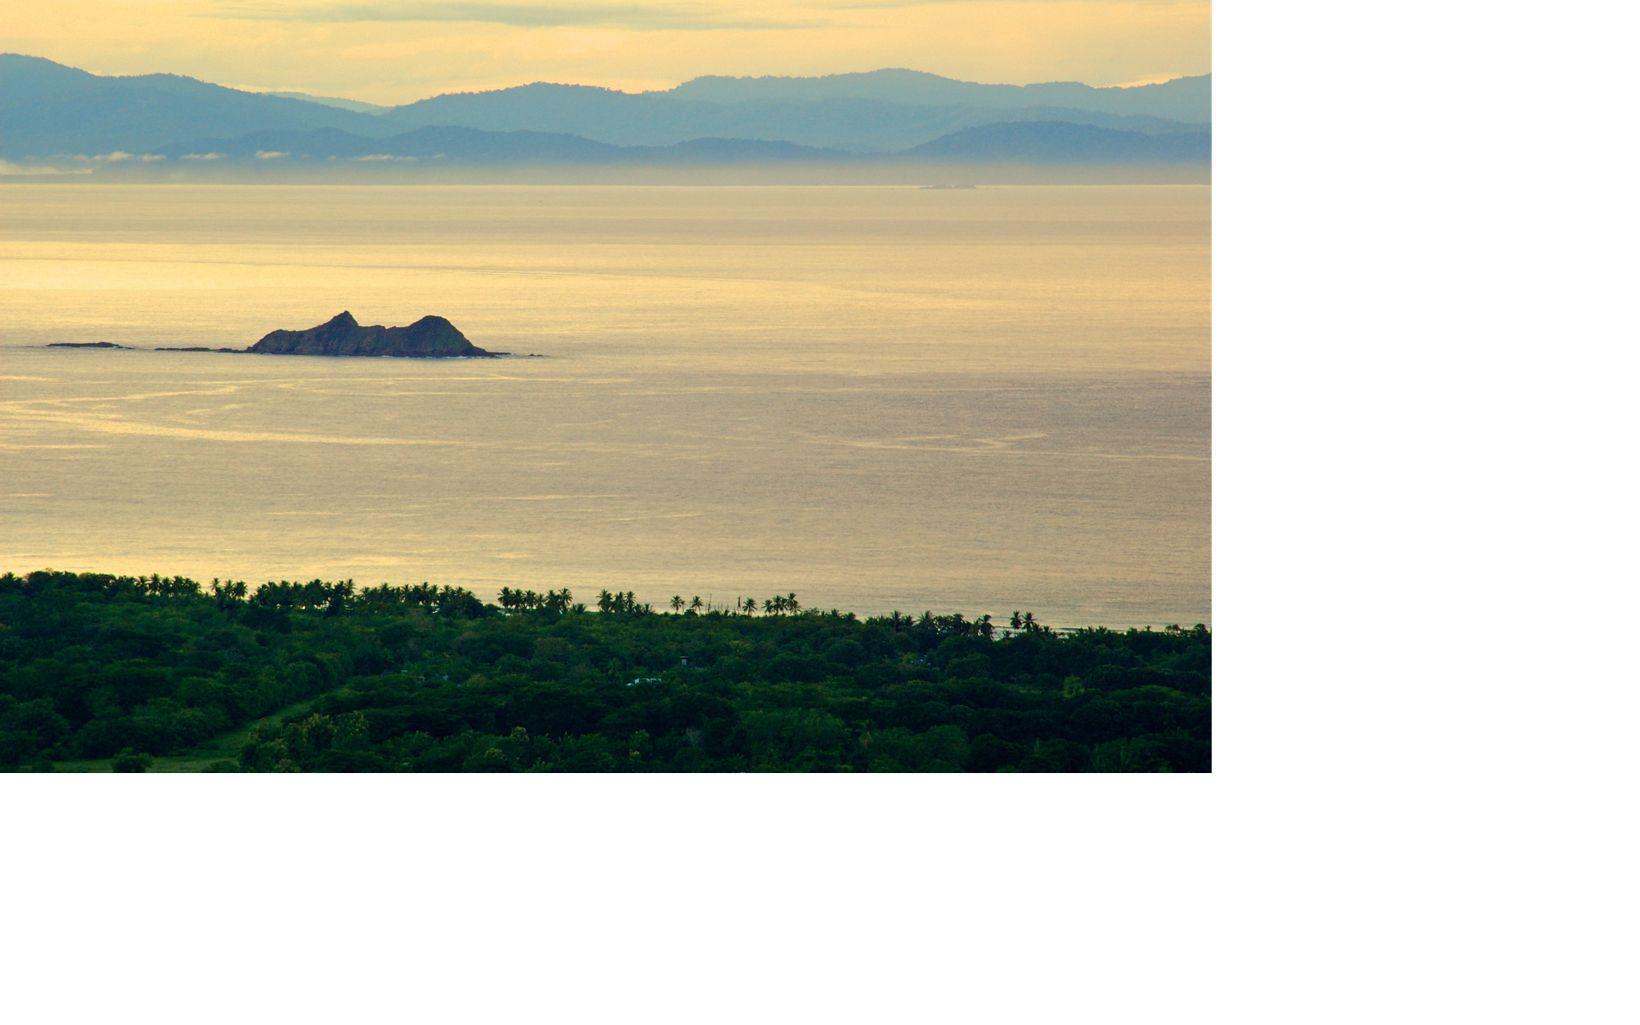 Parque Nacional Marino Ballena